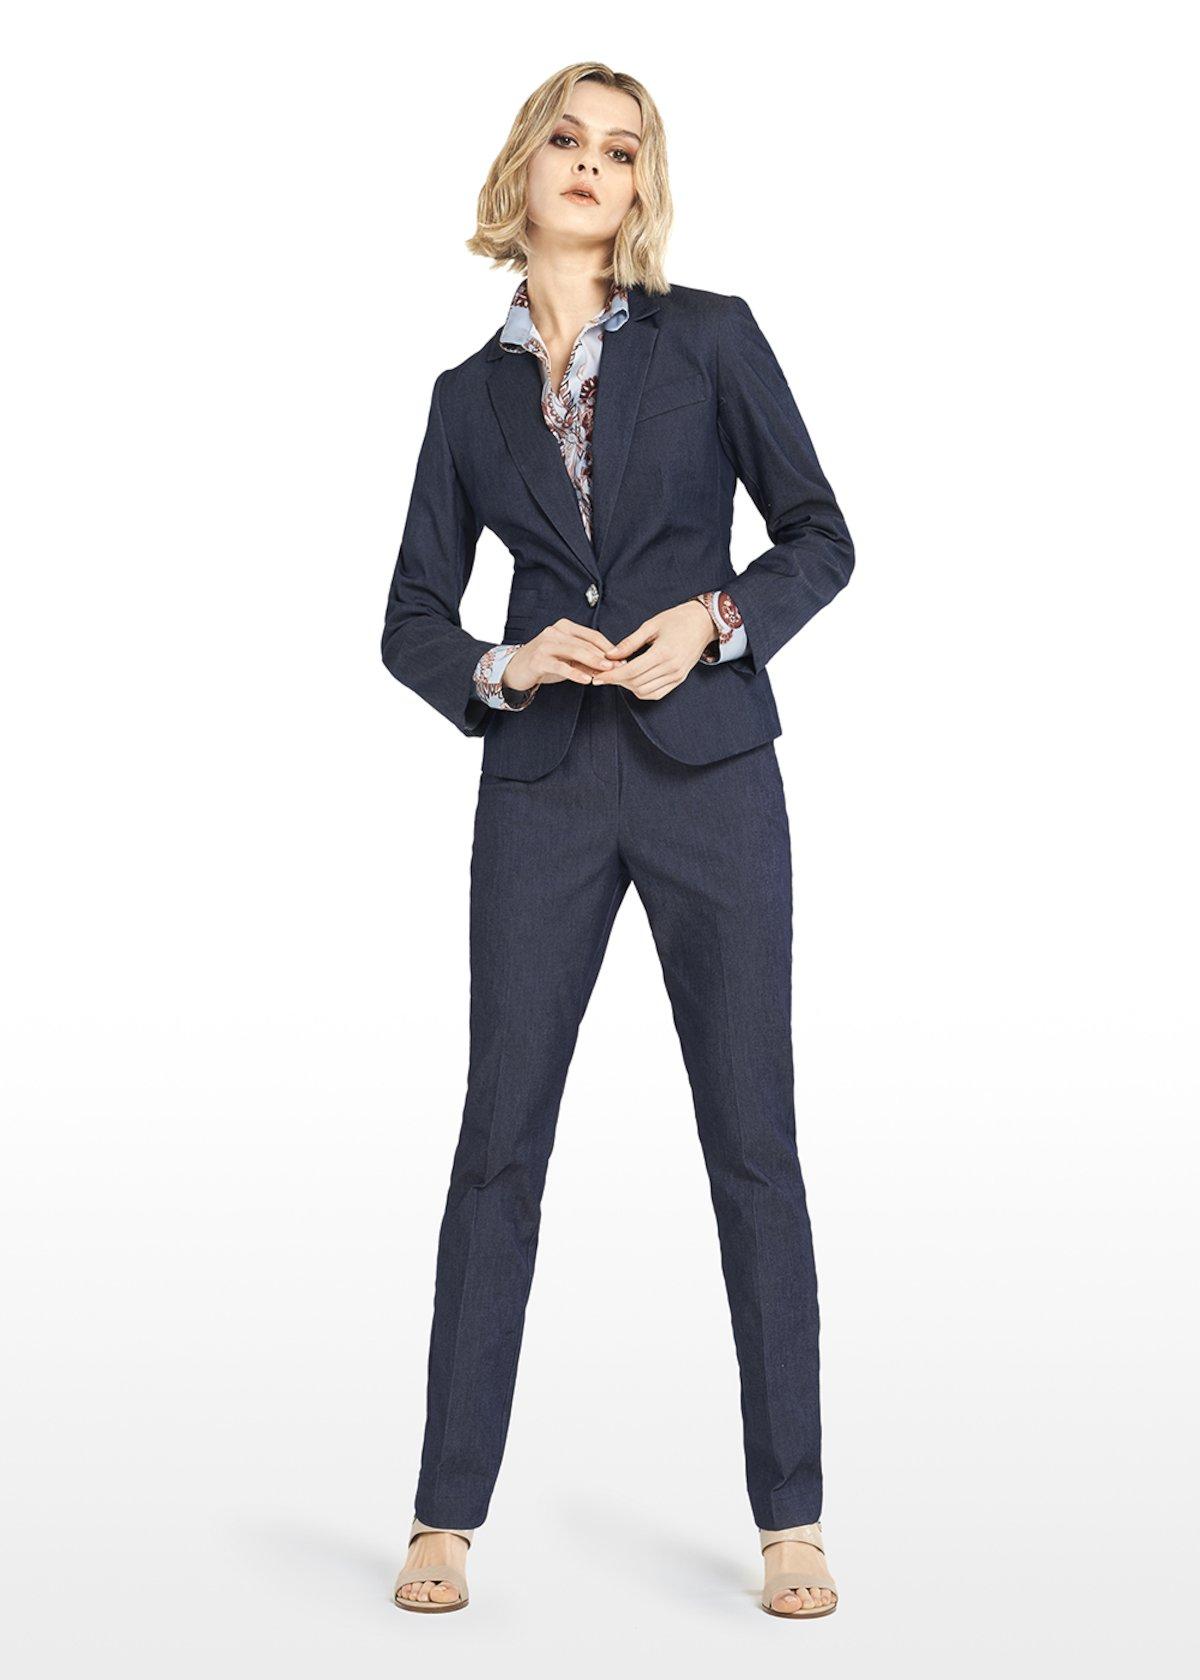 Gaynor Stretch denim jacket and jewel button - Blue - Woman